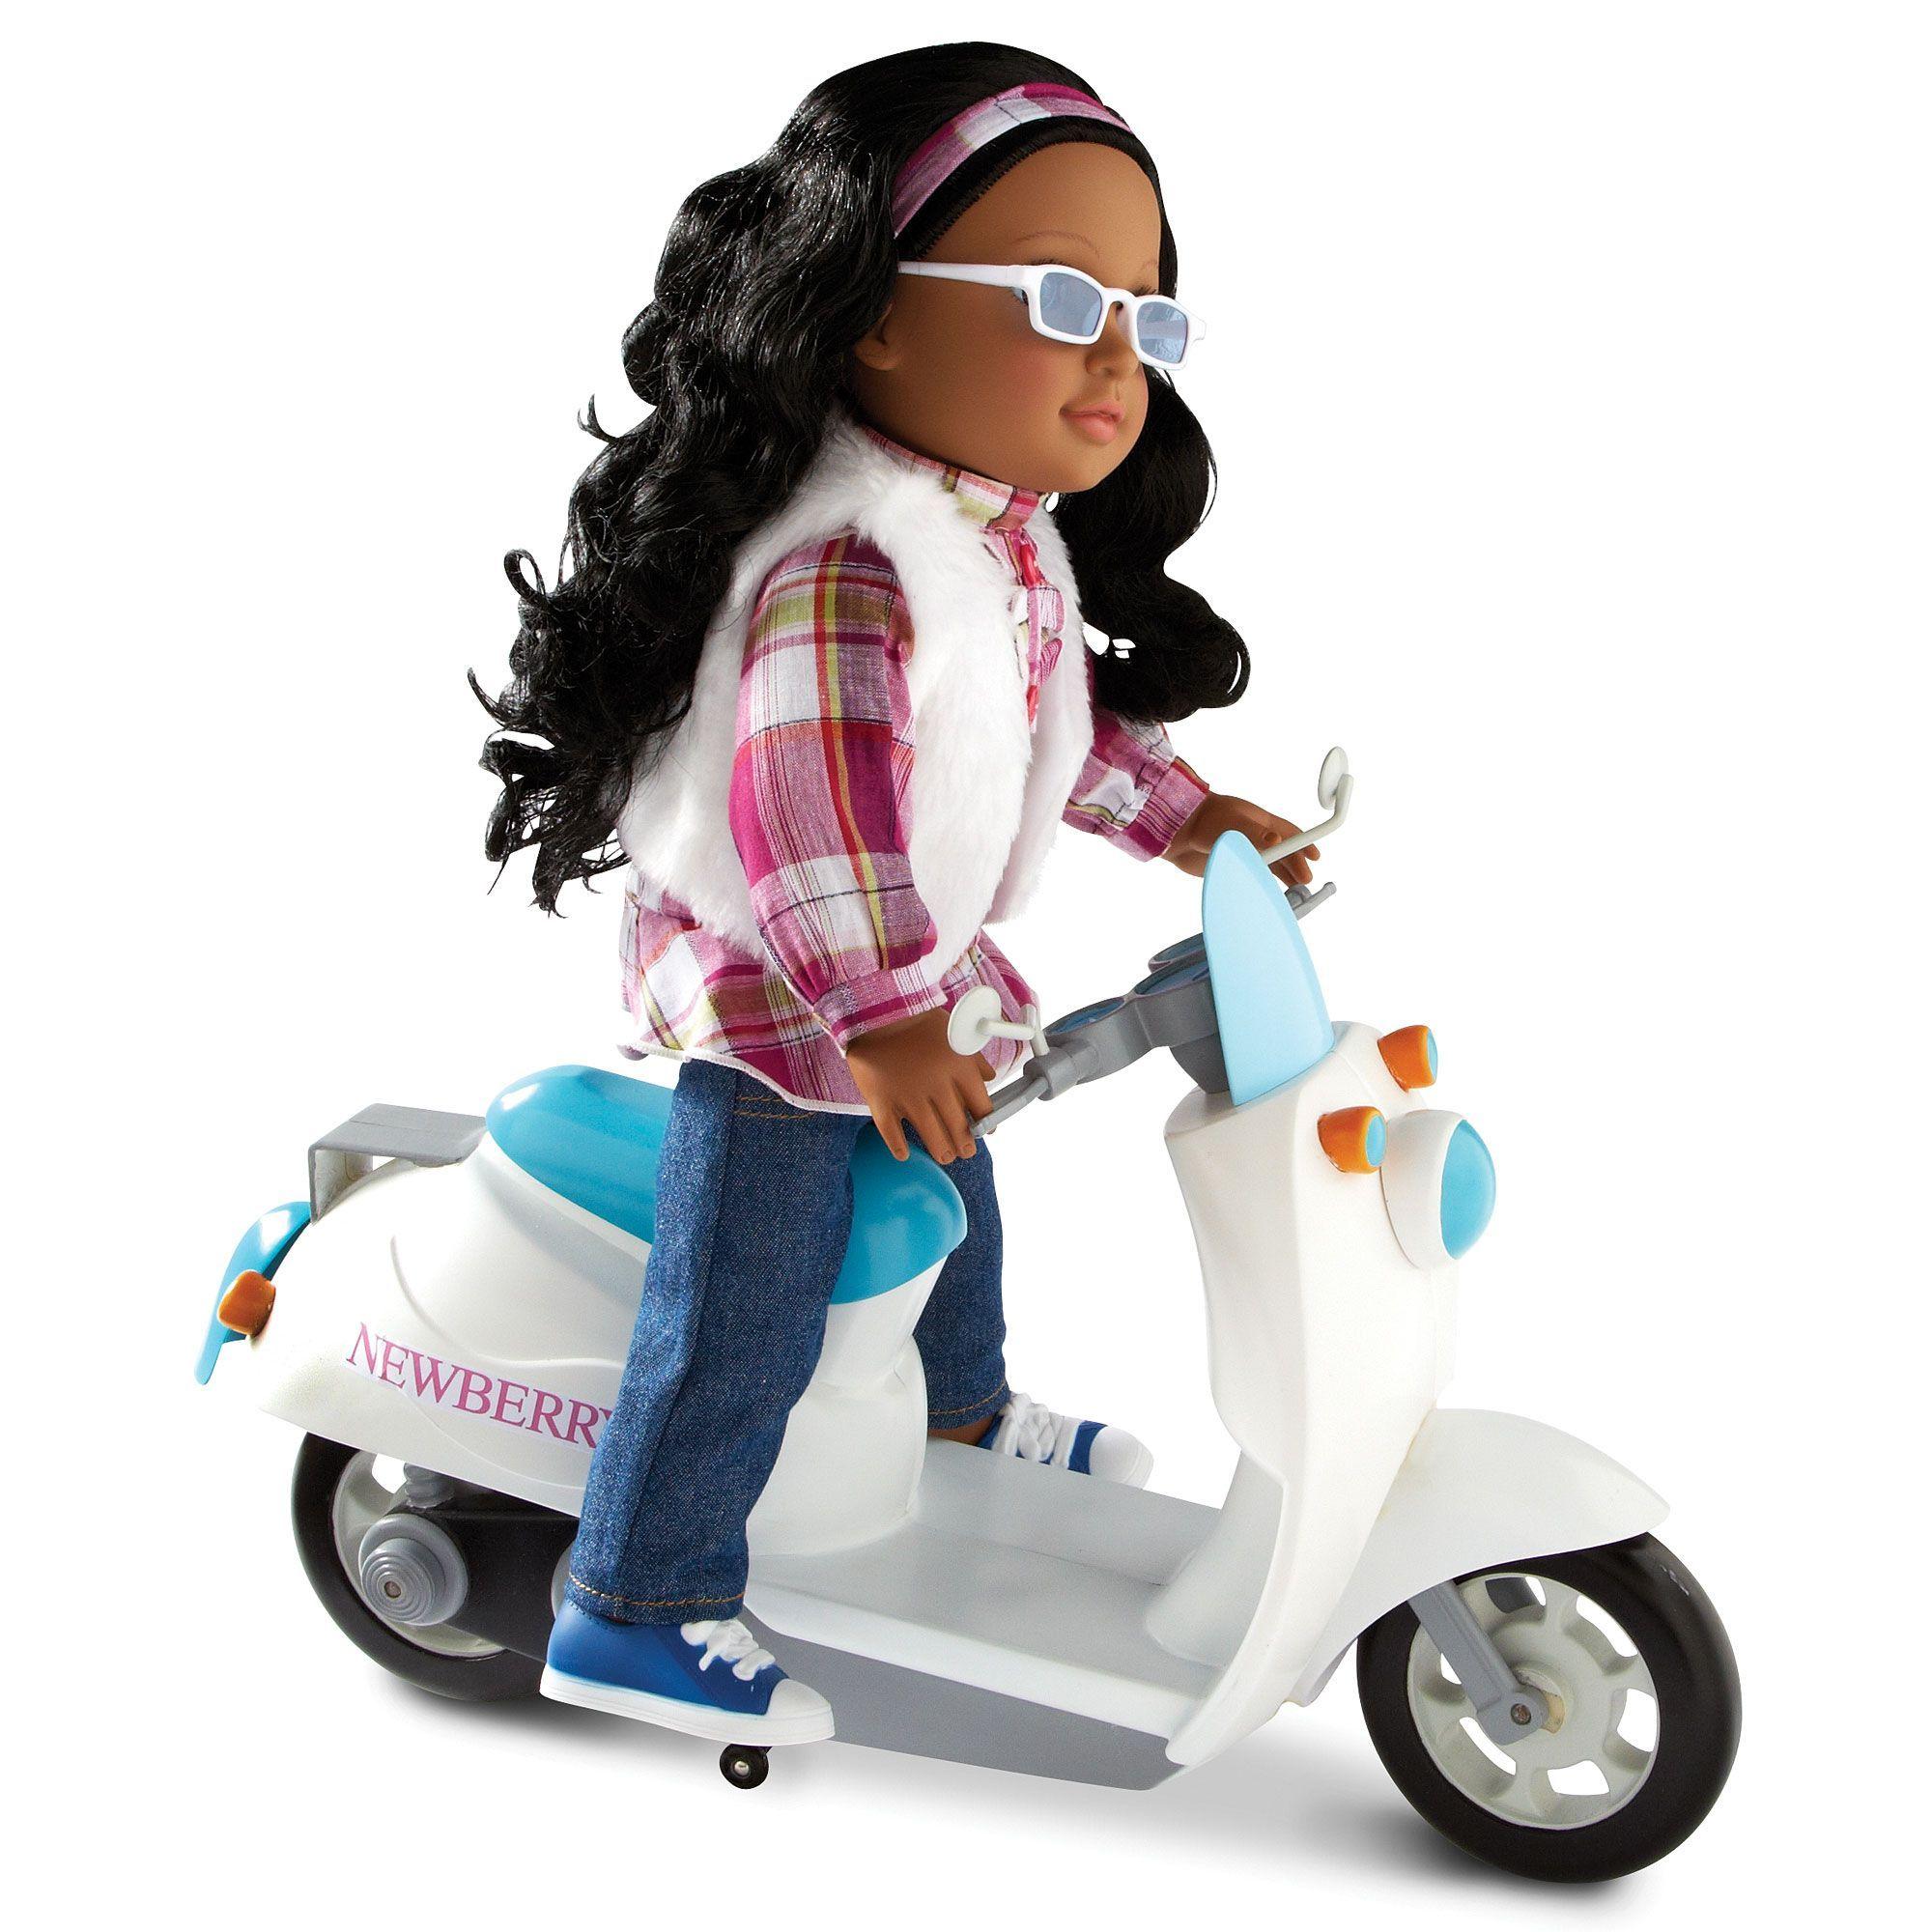 SearsWishlist NB Motorcycle (electronics) Fashion